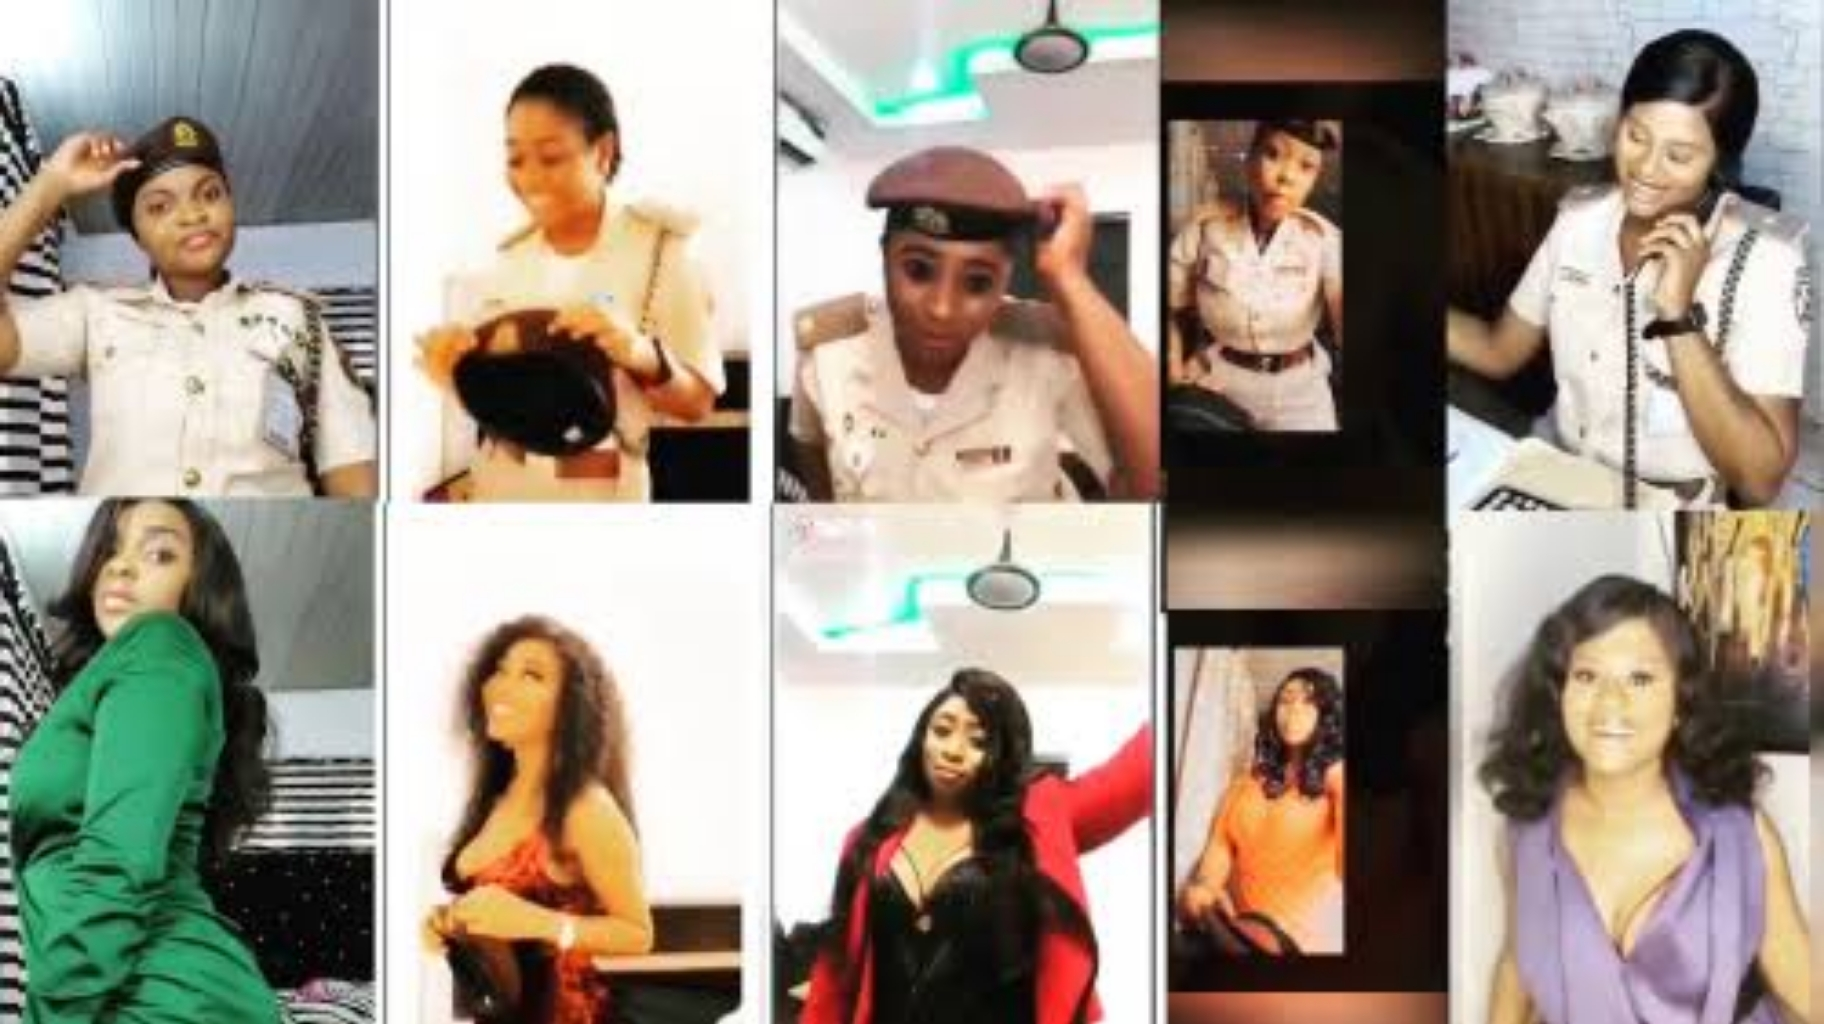 #BopDaddyChallenge: NIS suspends reposting of female officers after Falz' intervention